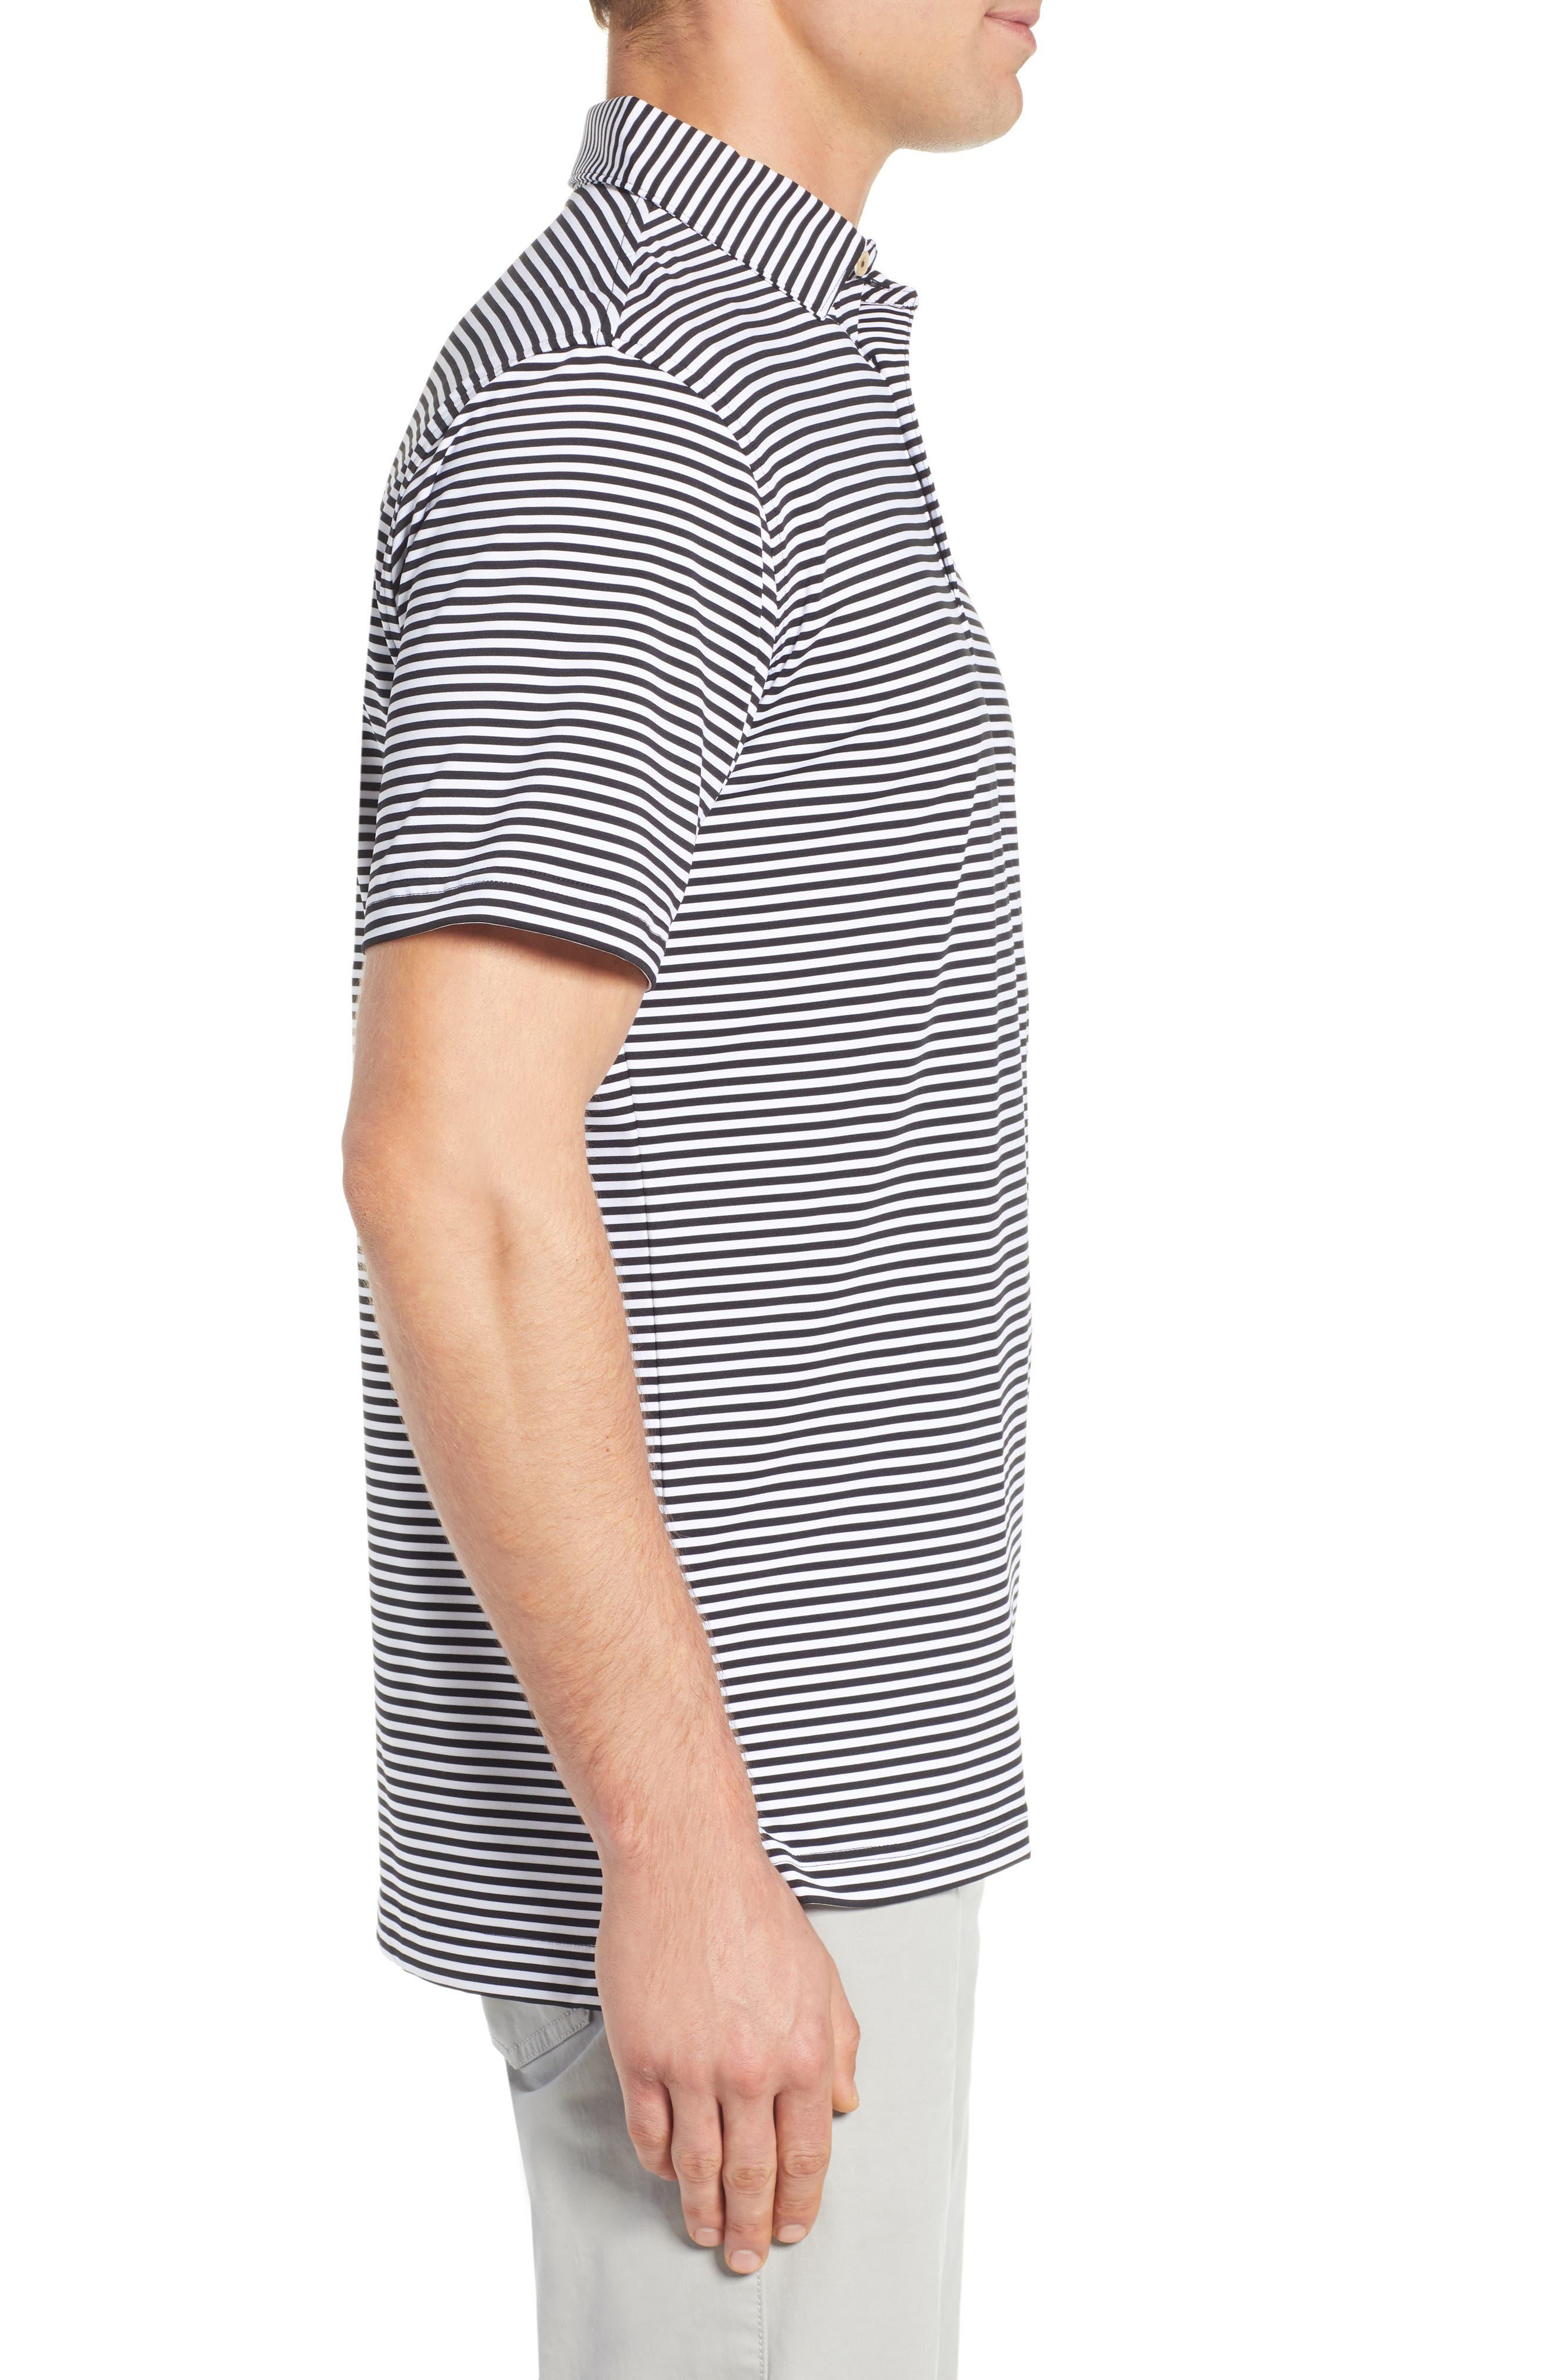 PETER MILLAR, Stripe Stretch Jersey Performance Polo, Alternate thumbnail 3, color, BLACK/WHITE